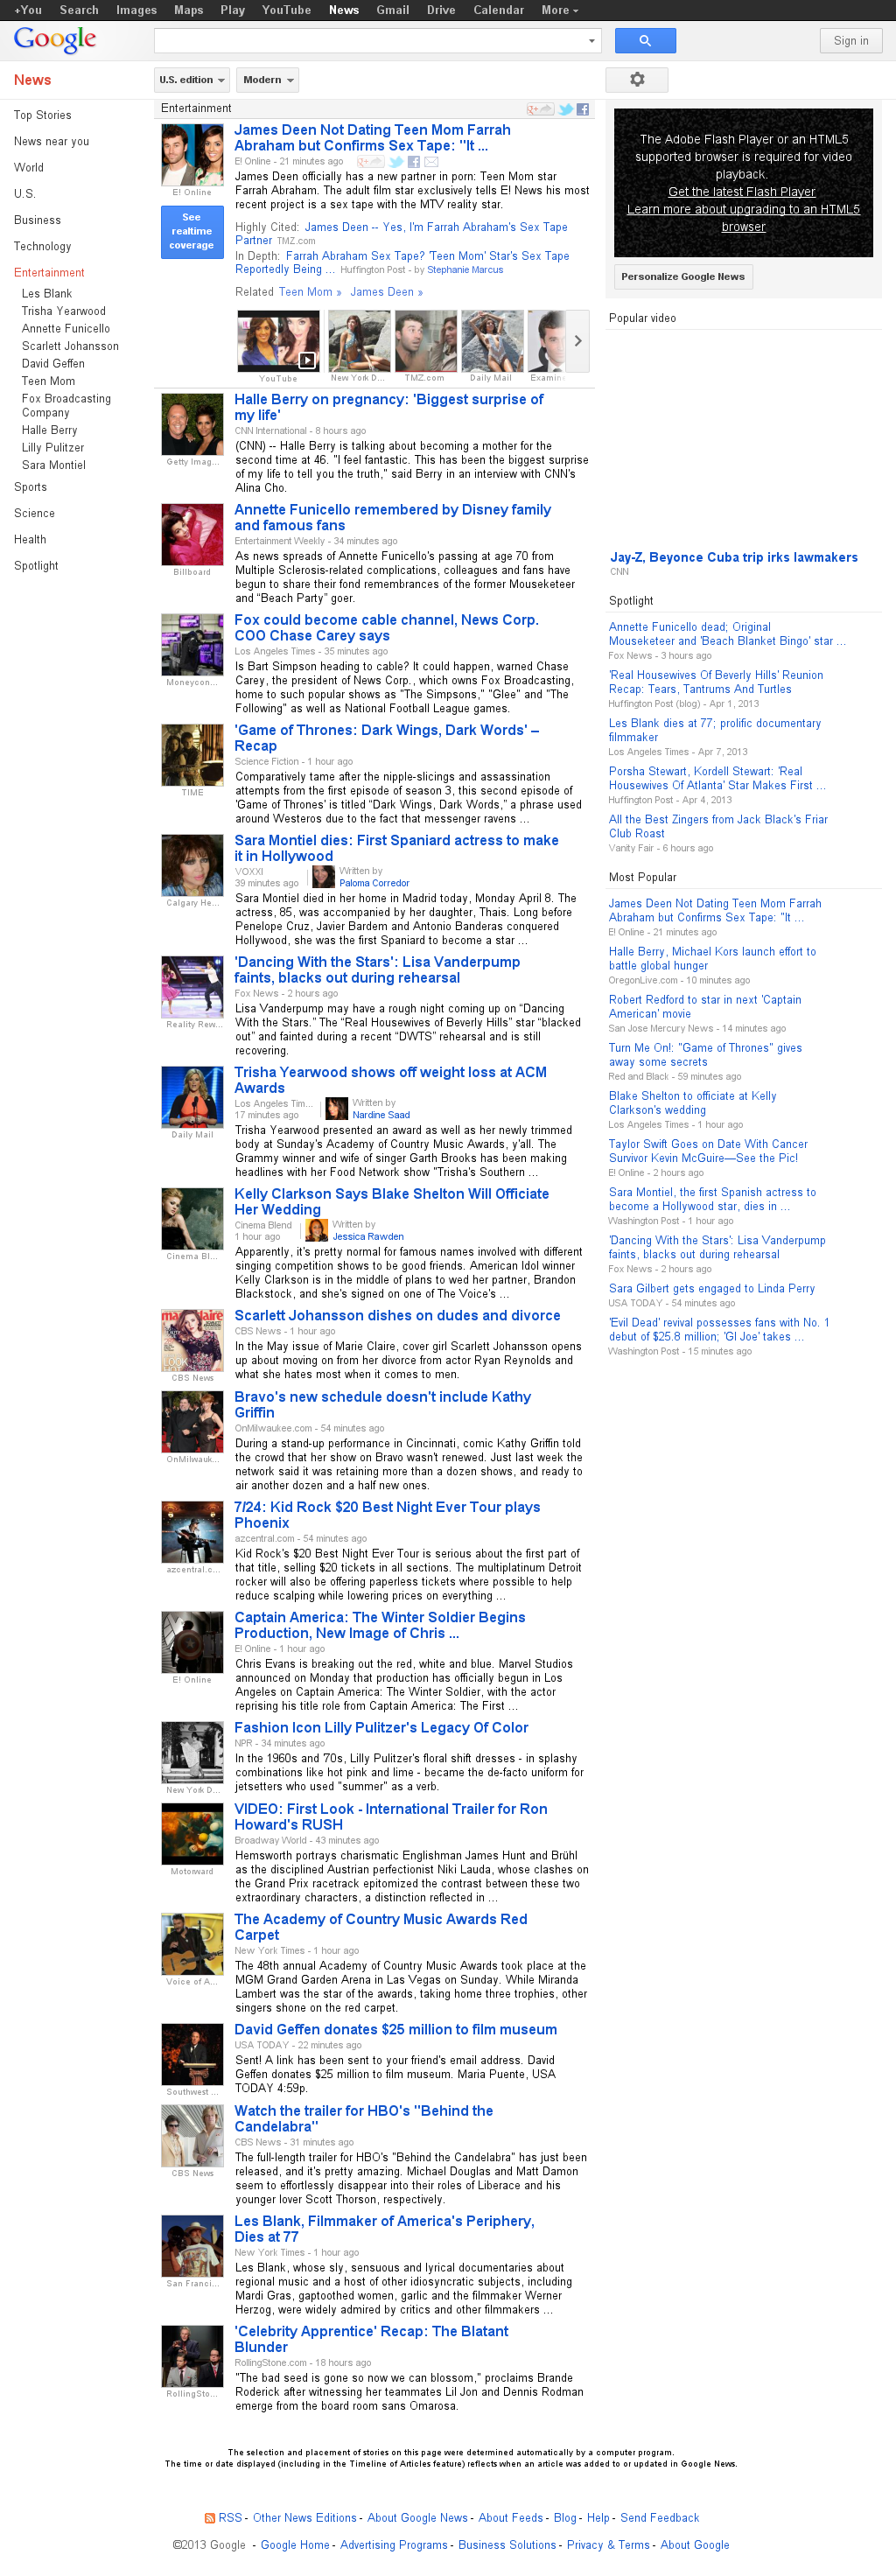 Google News: Entertainment at Monday April 8, 2013, 9:08 p.m. UTC